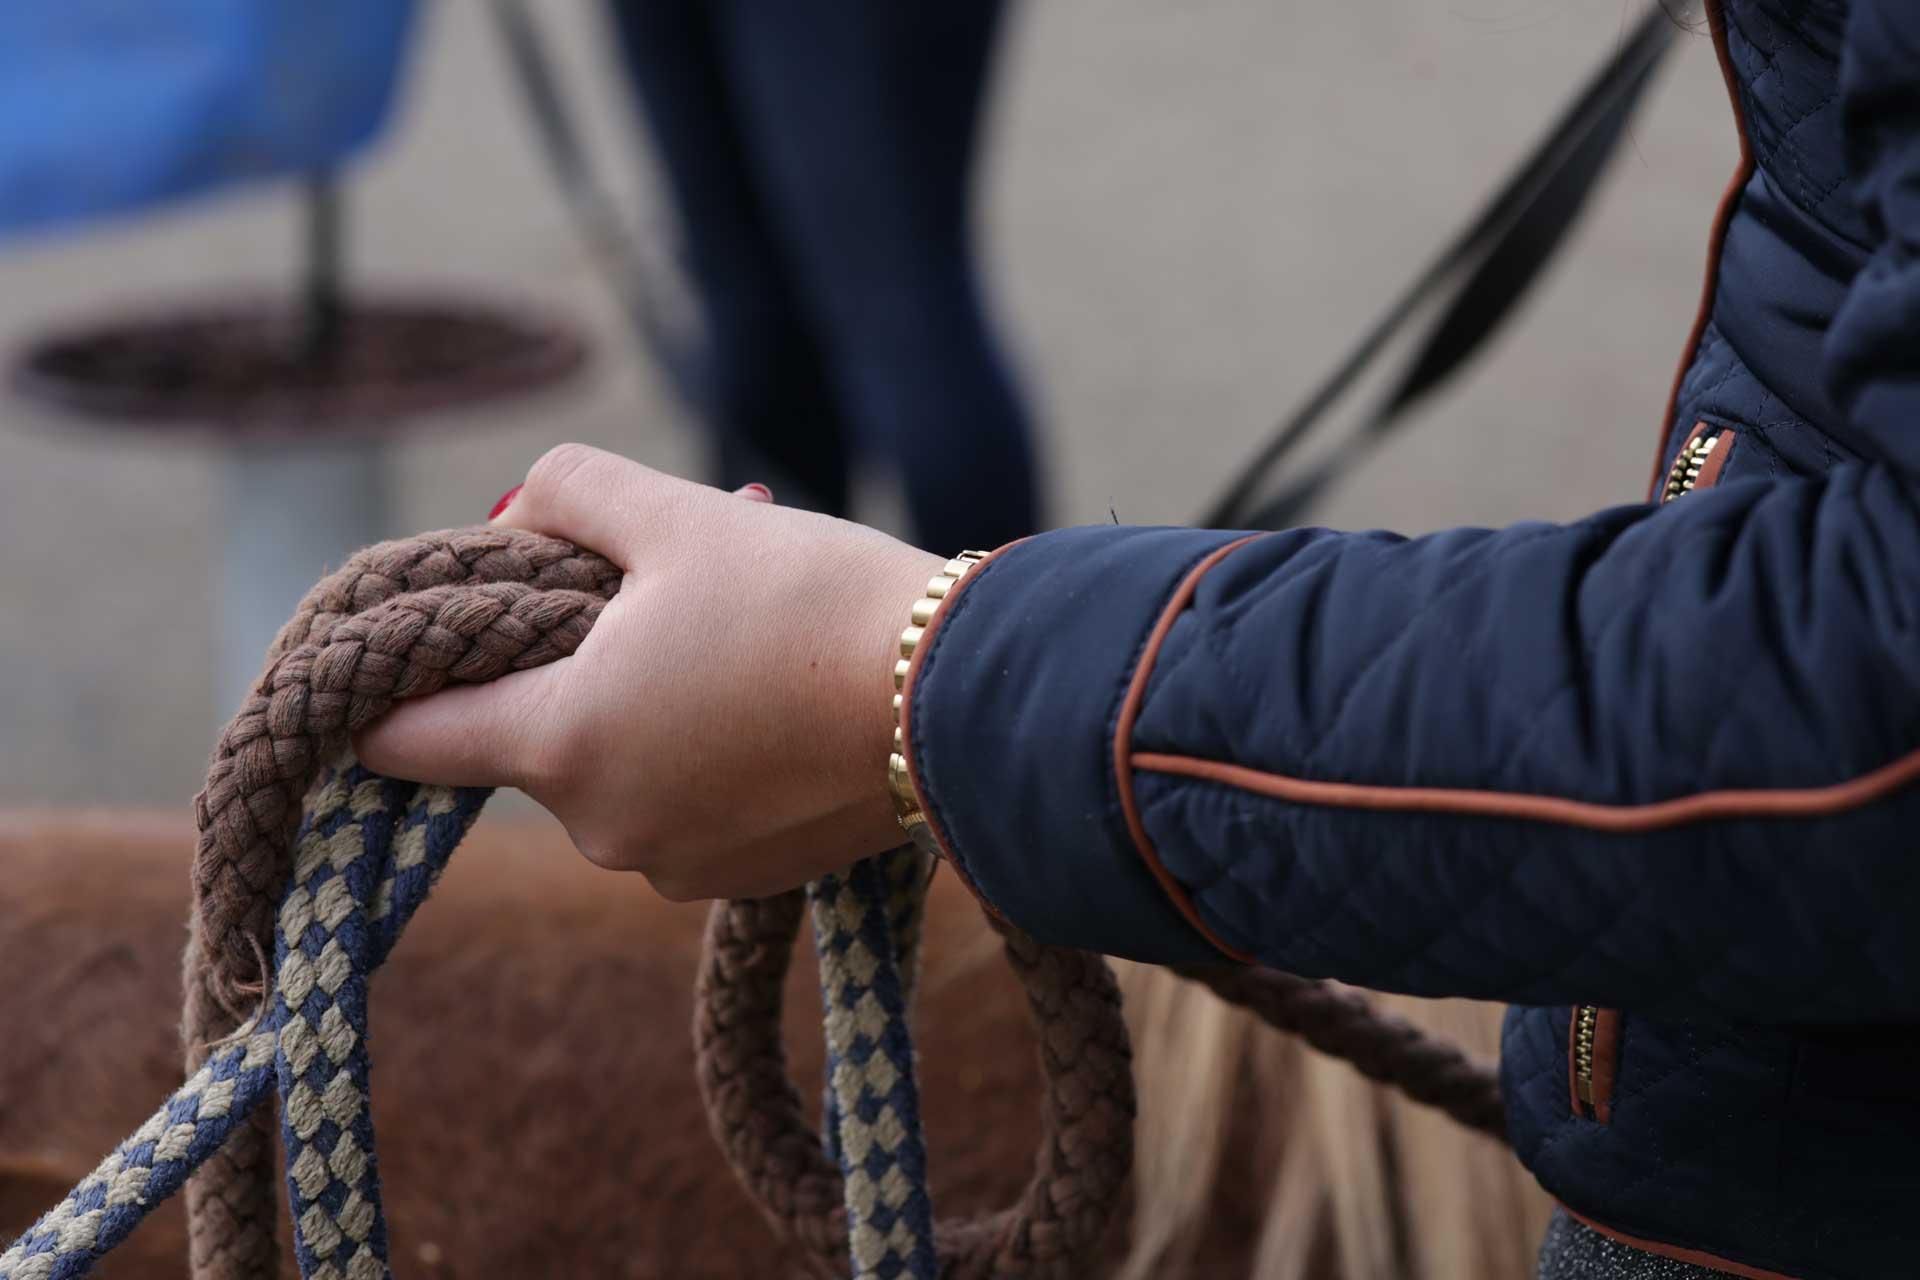 Hand am Seil